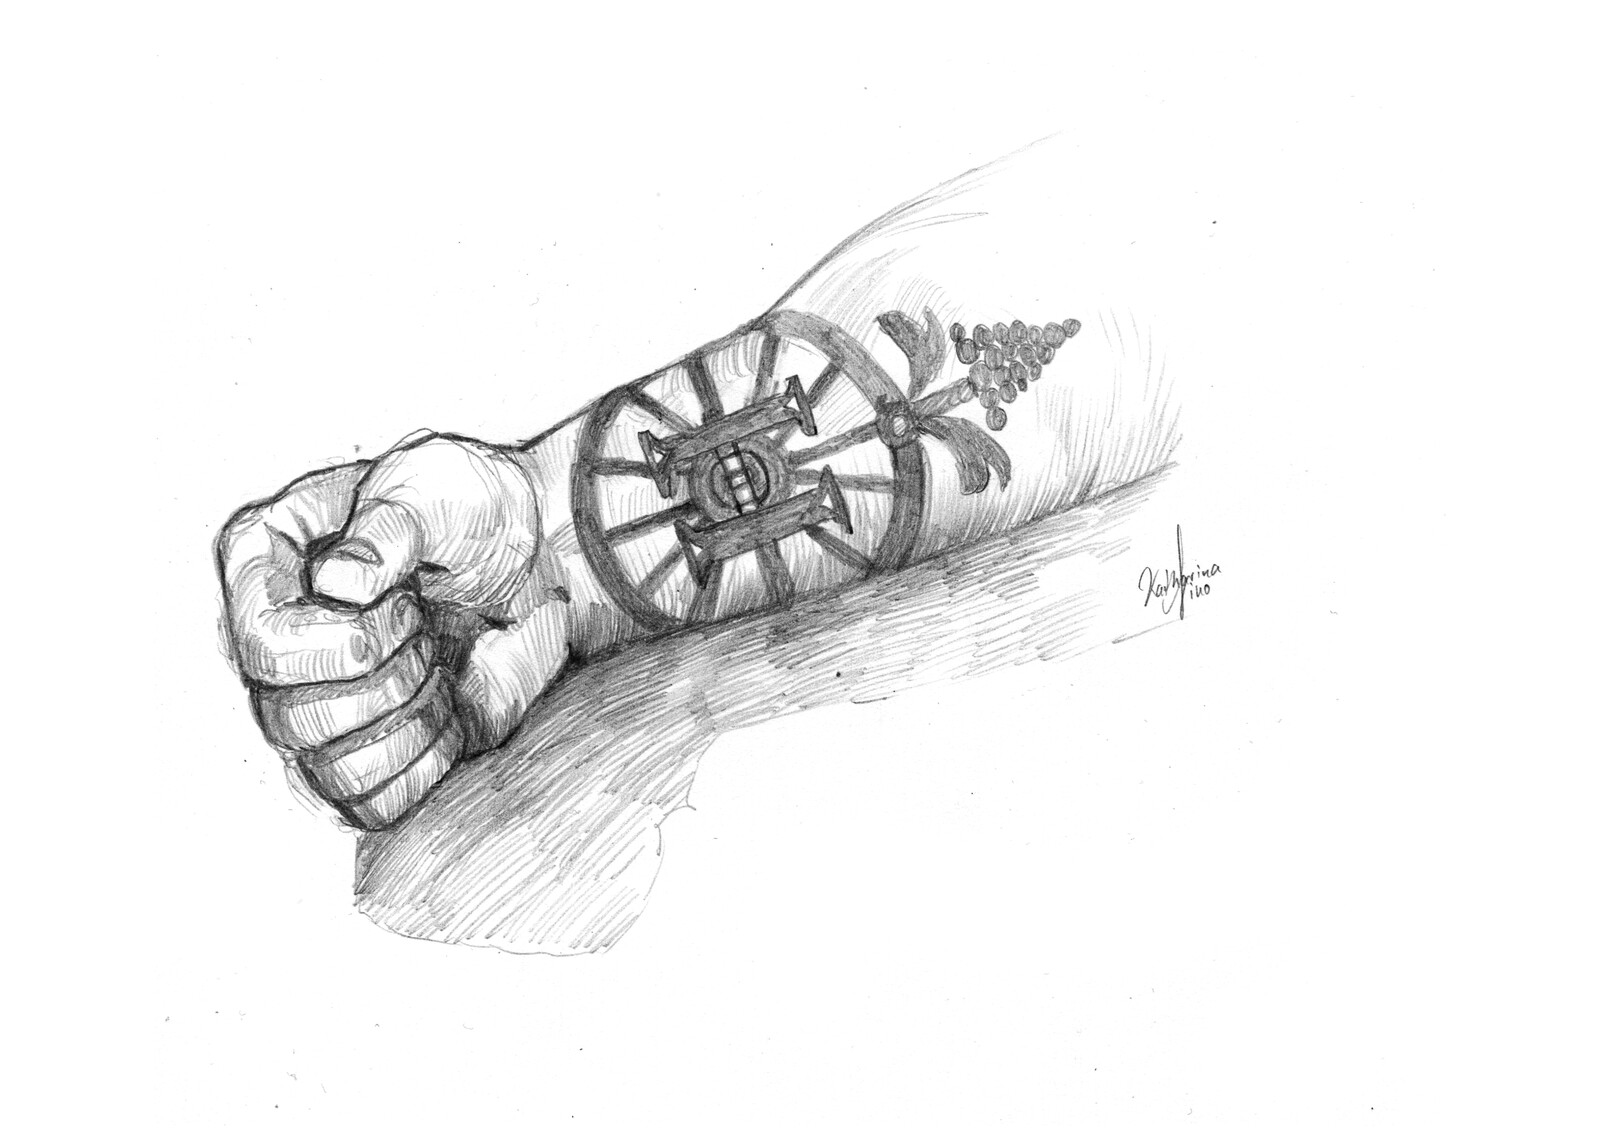 EARTHDAWN: A tattooed symbol of a merchant house